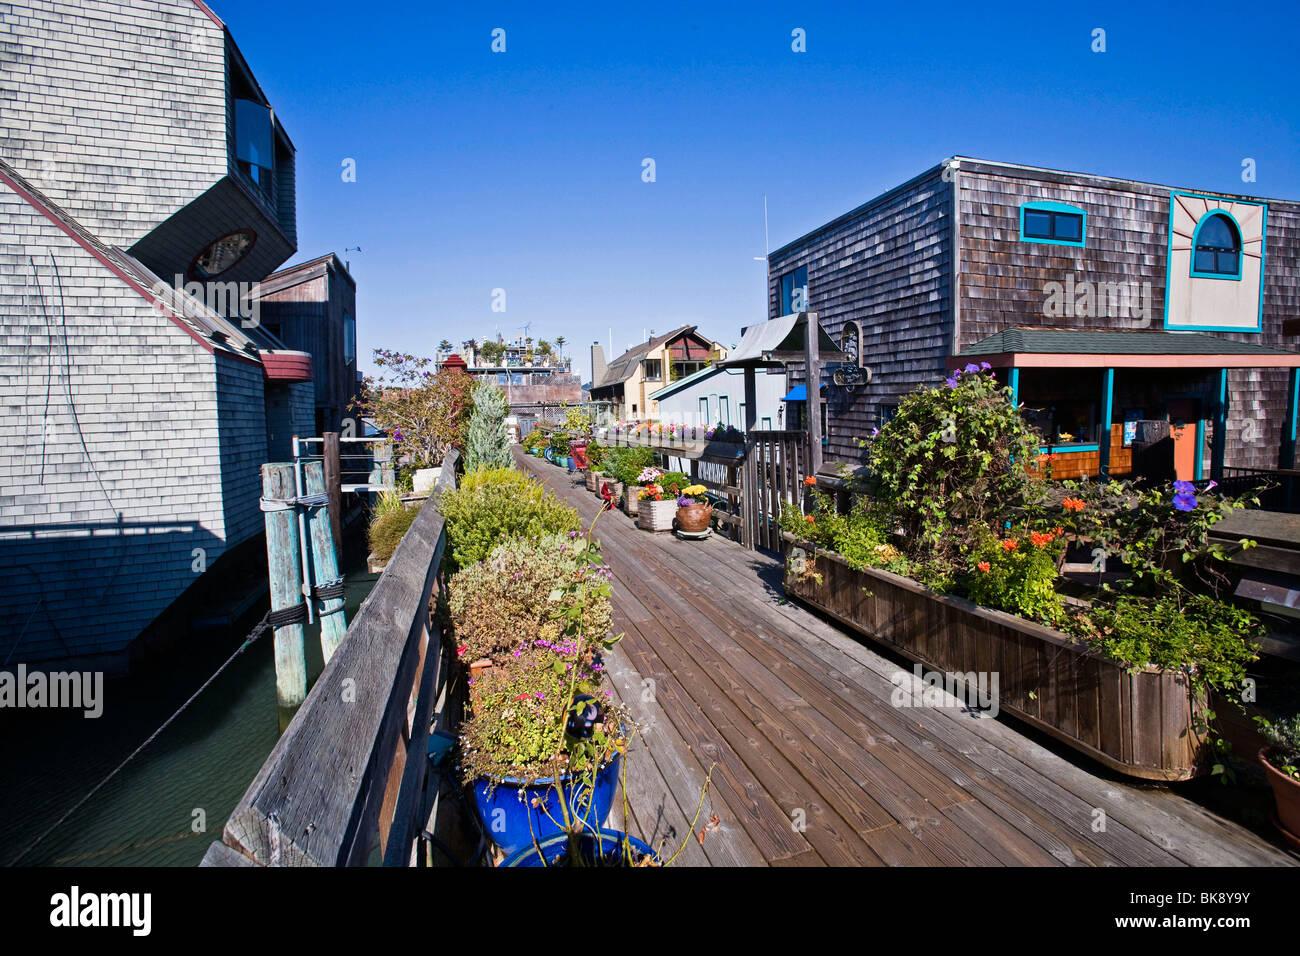 United States: San Francisco in California - Stock Image